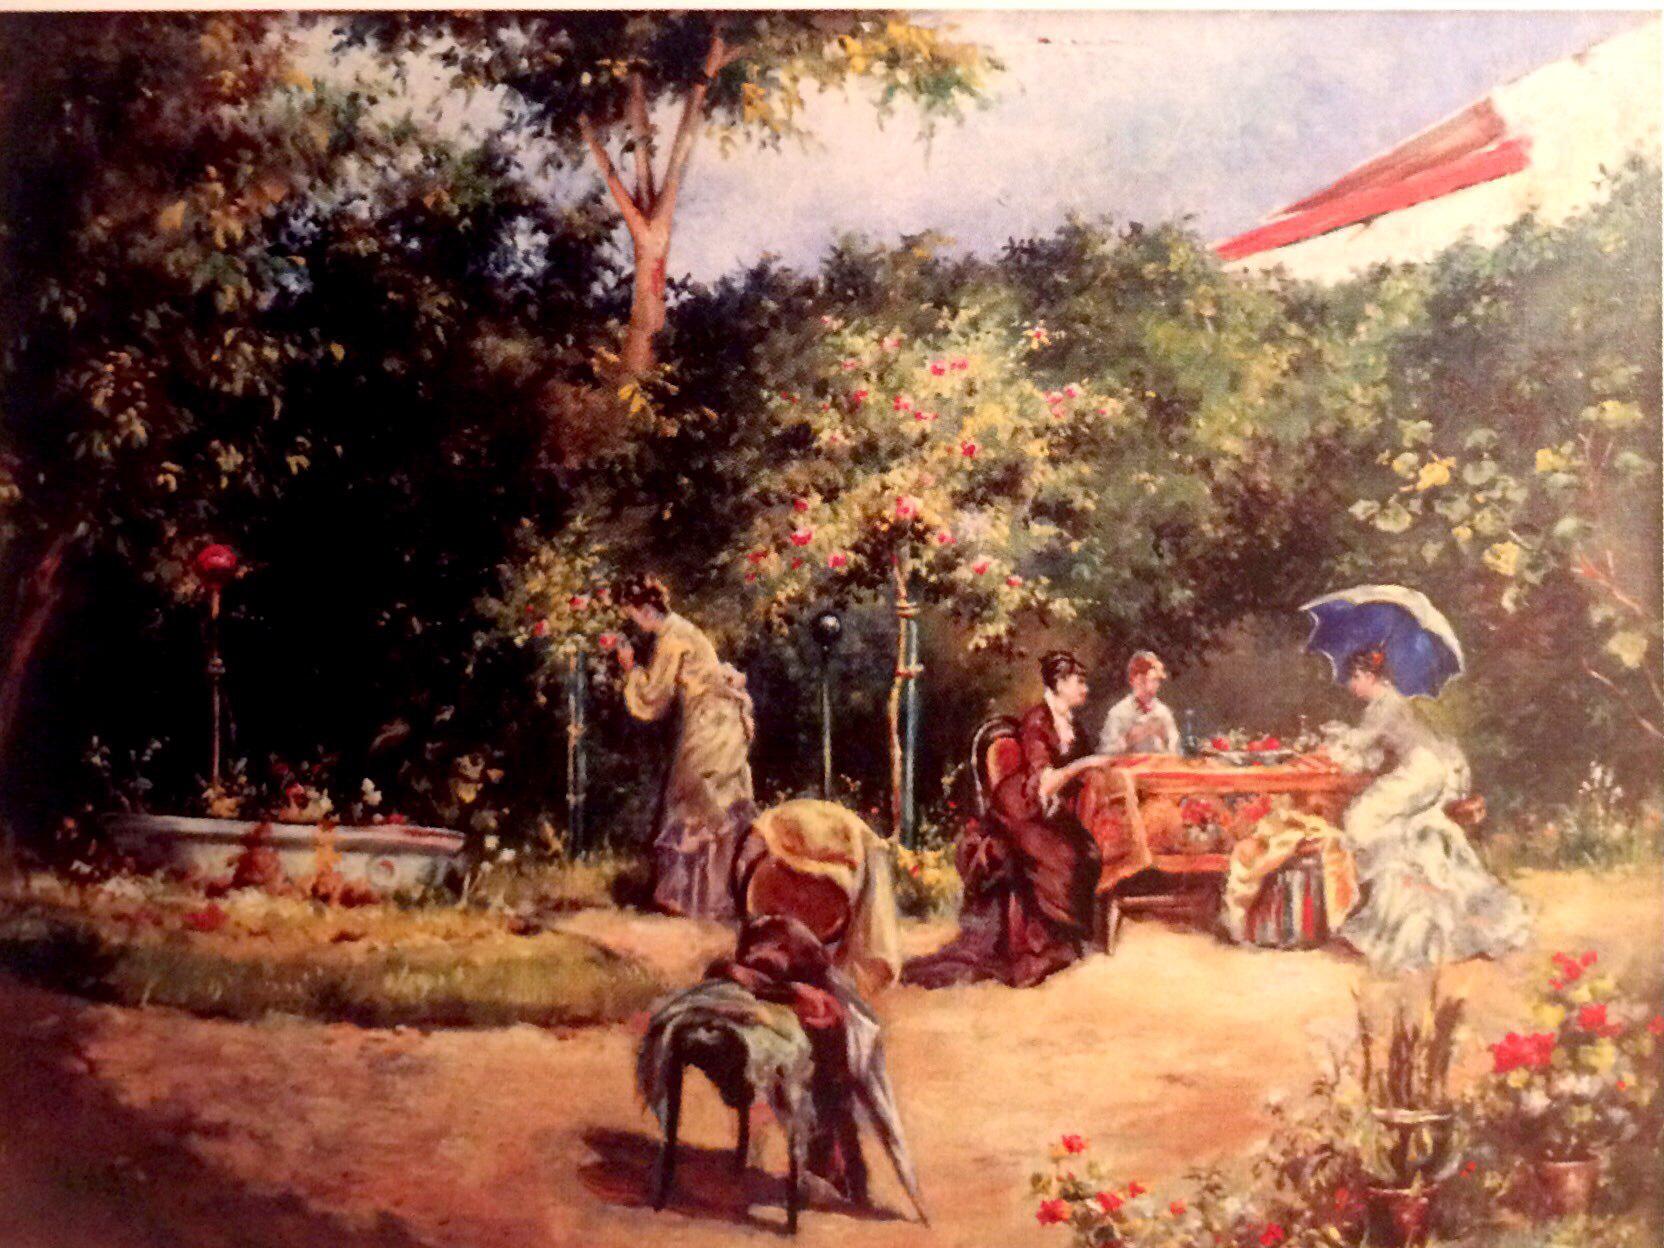 Theodor AMAN, The Garden